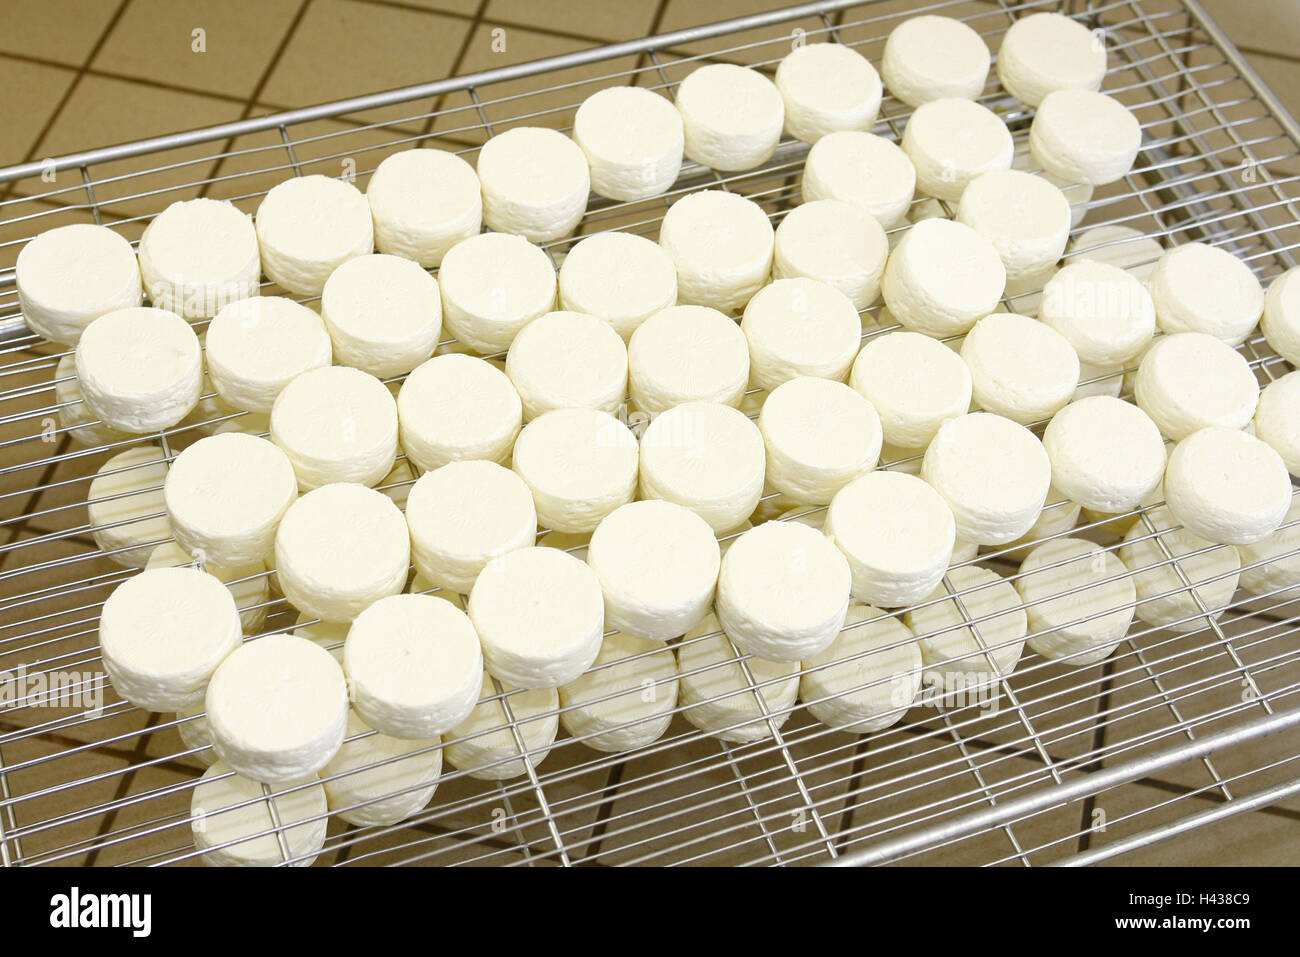 Cheese dairy, maturity chamber, gratings, Käselaiber, - Stock Image